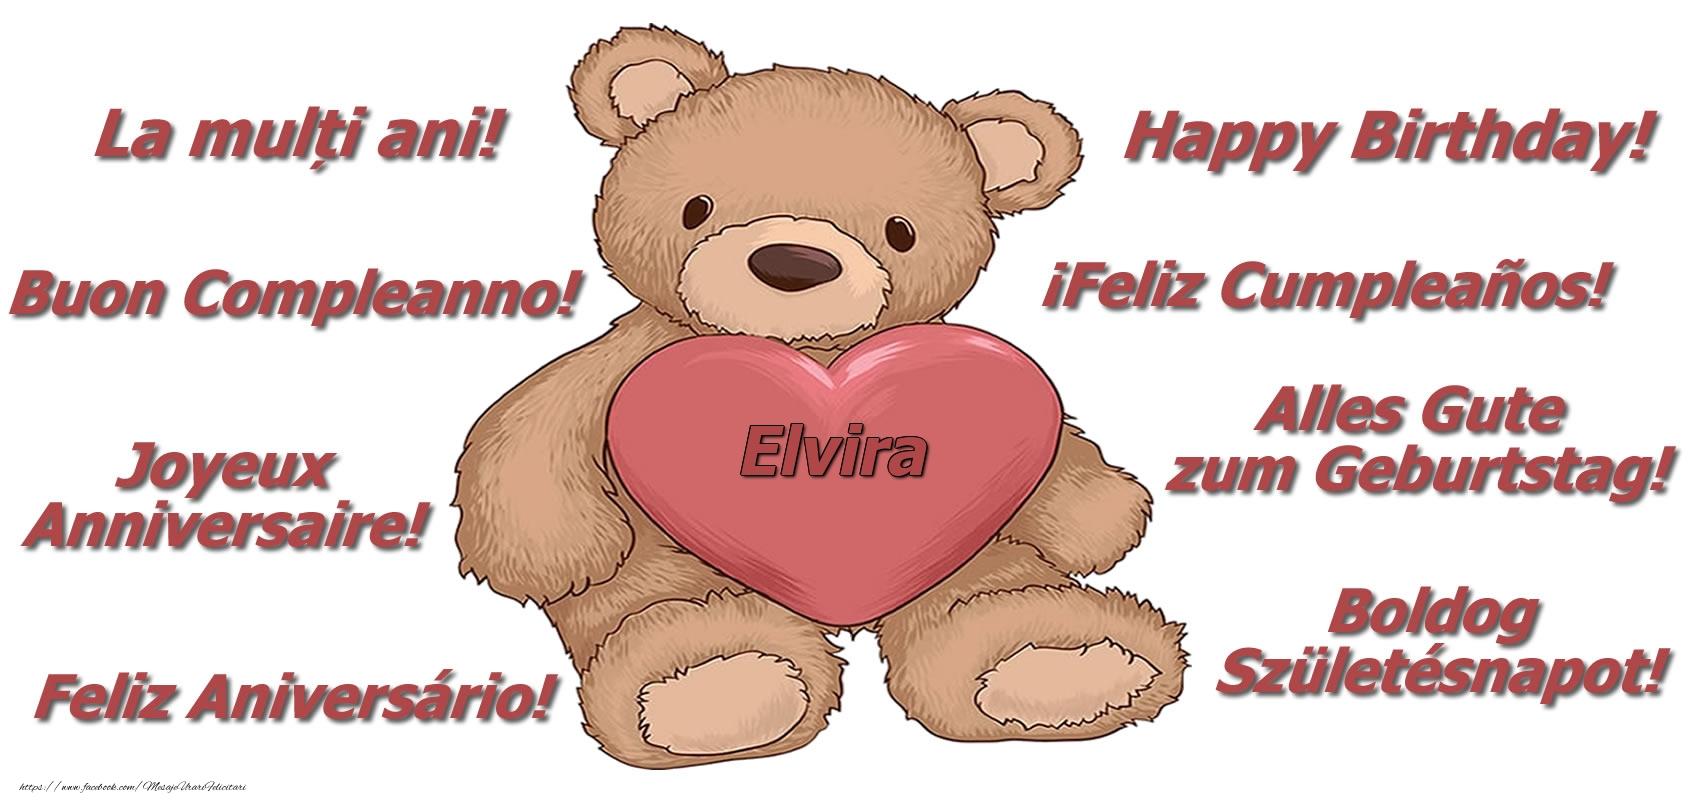 Felicitari de zi de nastere - La multi ani Elvira! - Ursulet